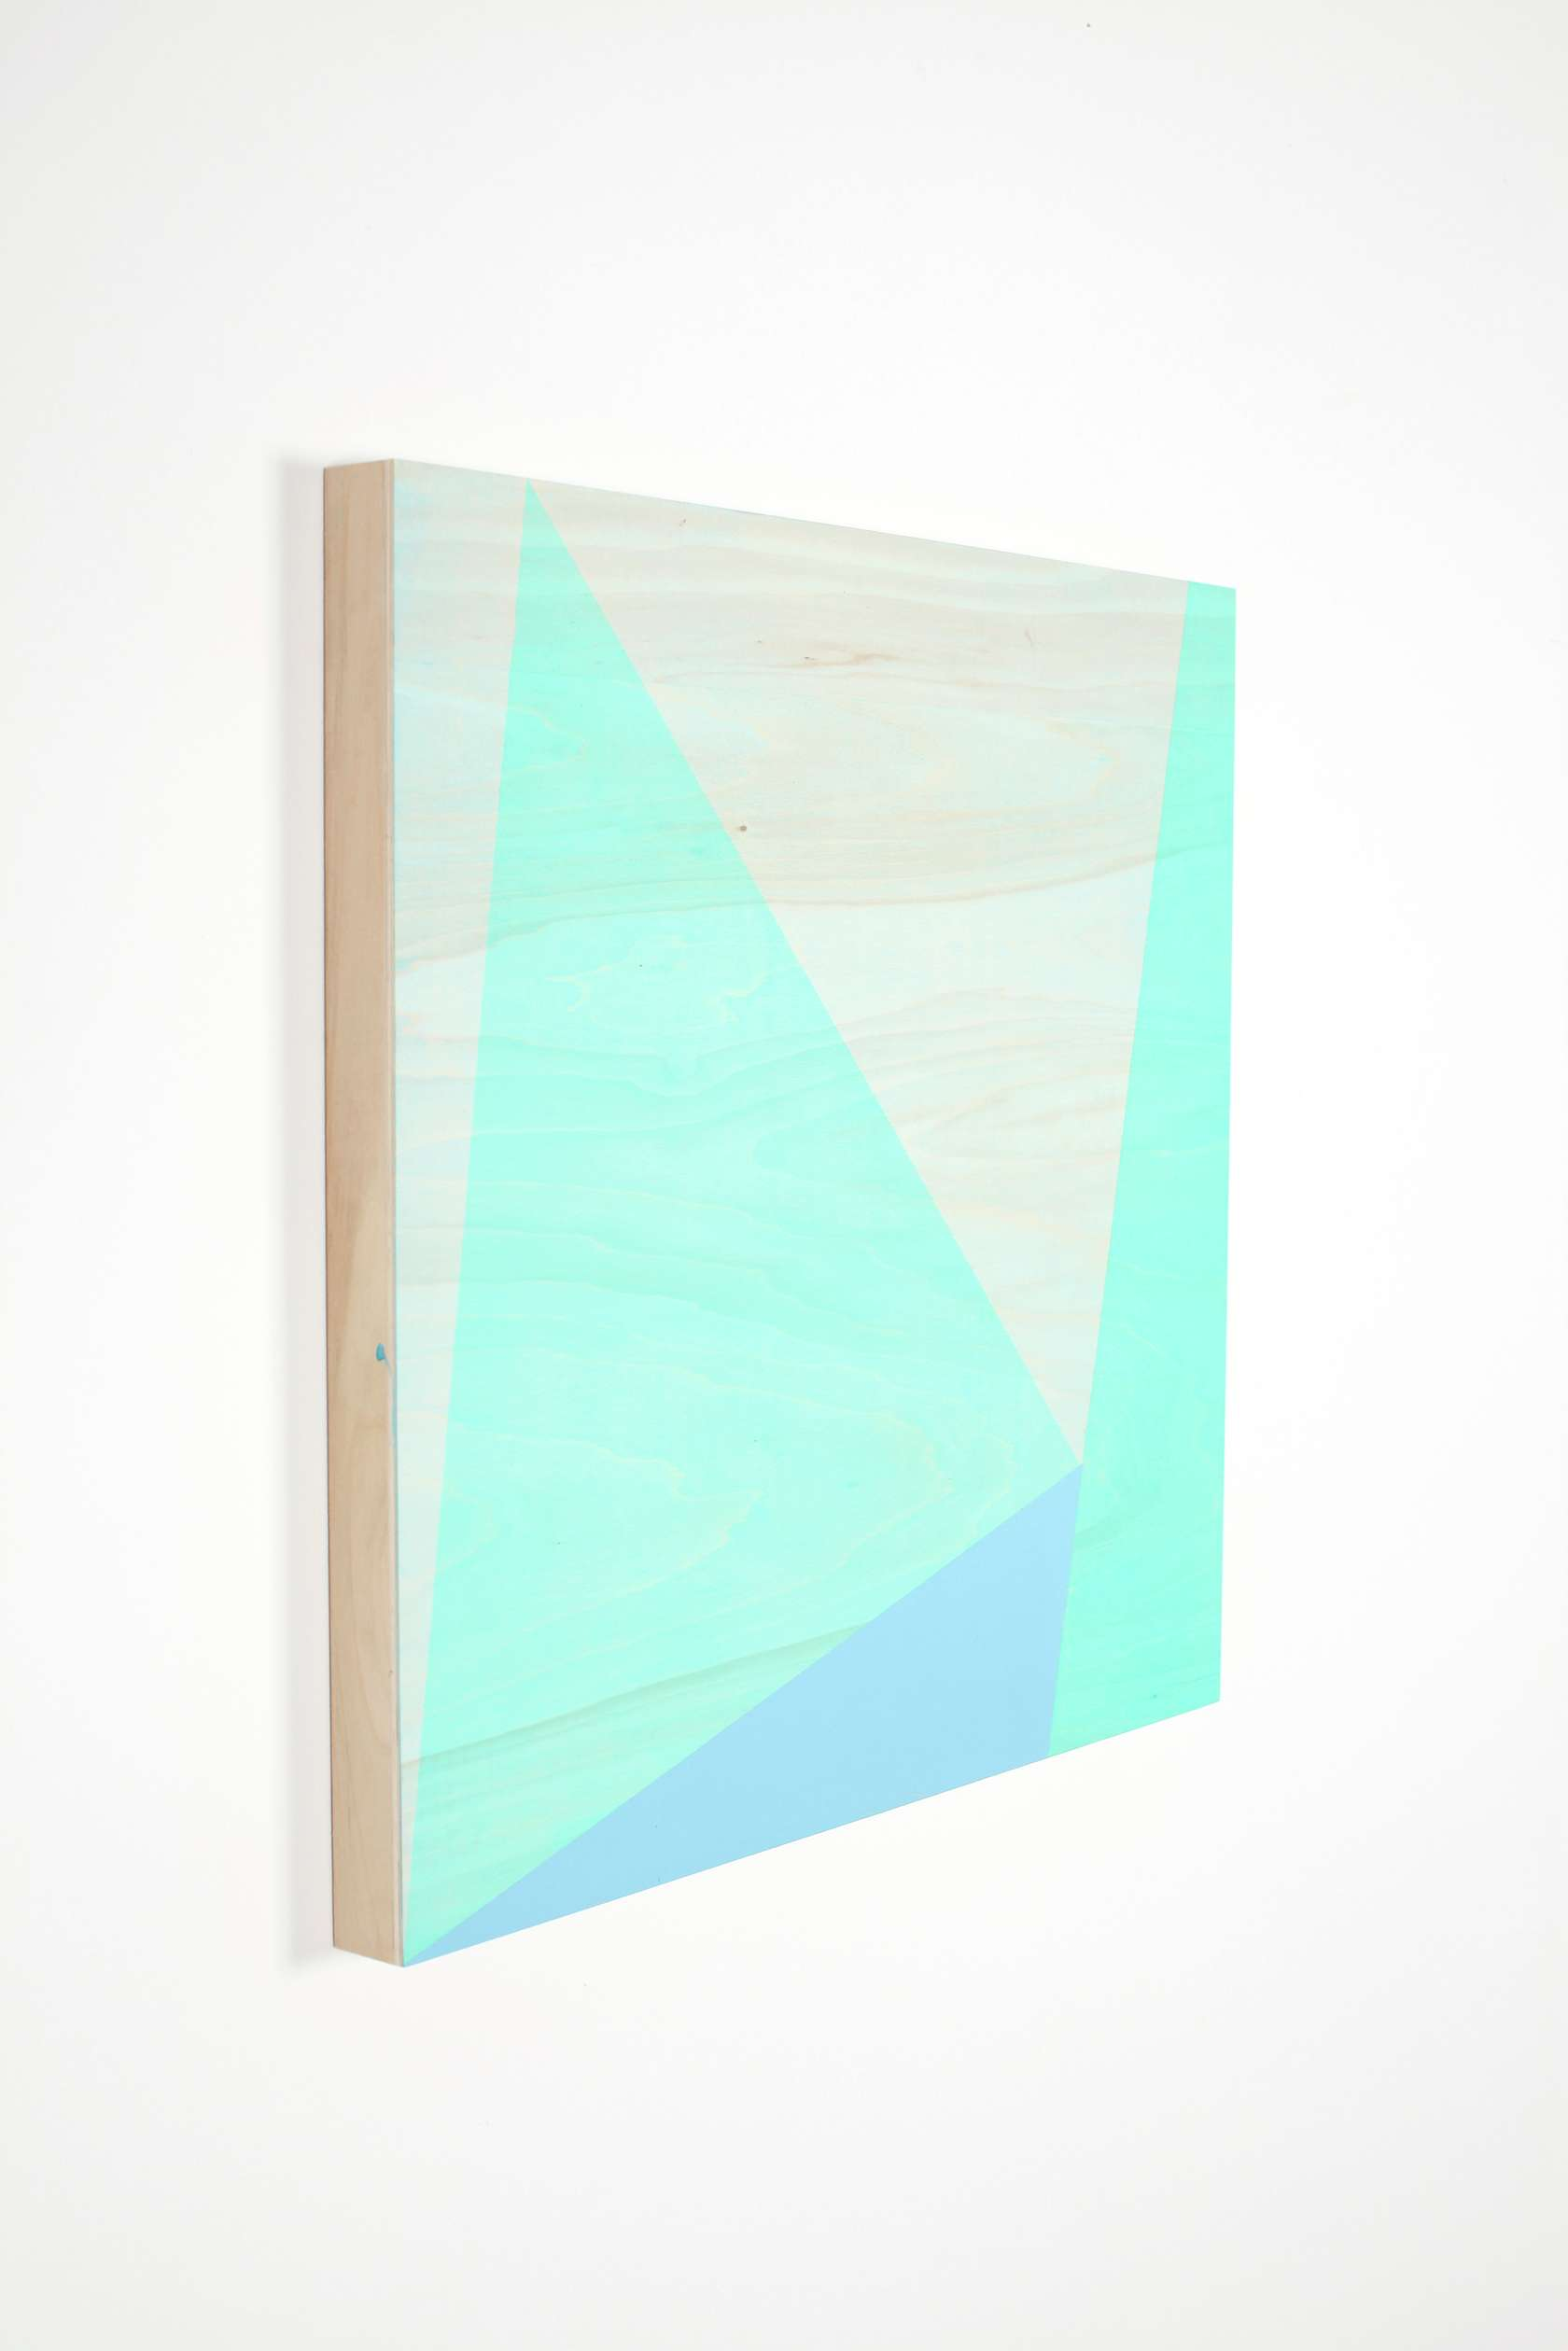 Bruno Rousselot Recent paintings Semiose 12 mars  — 30 avril 2011